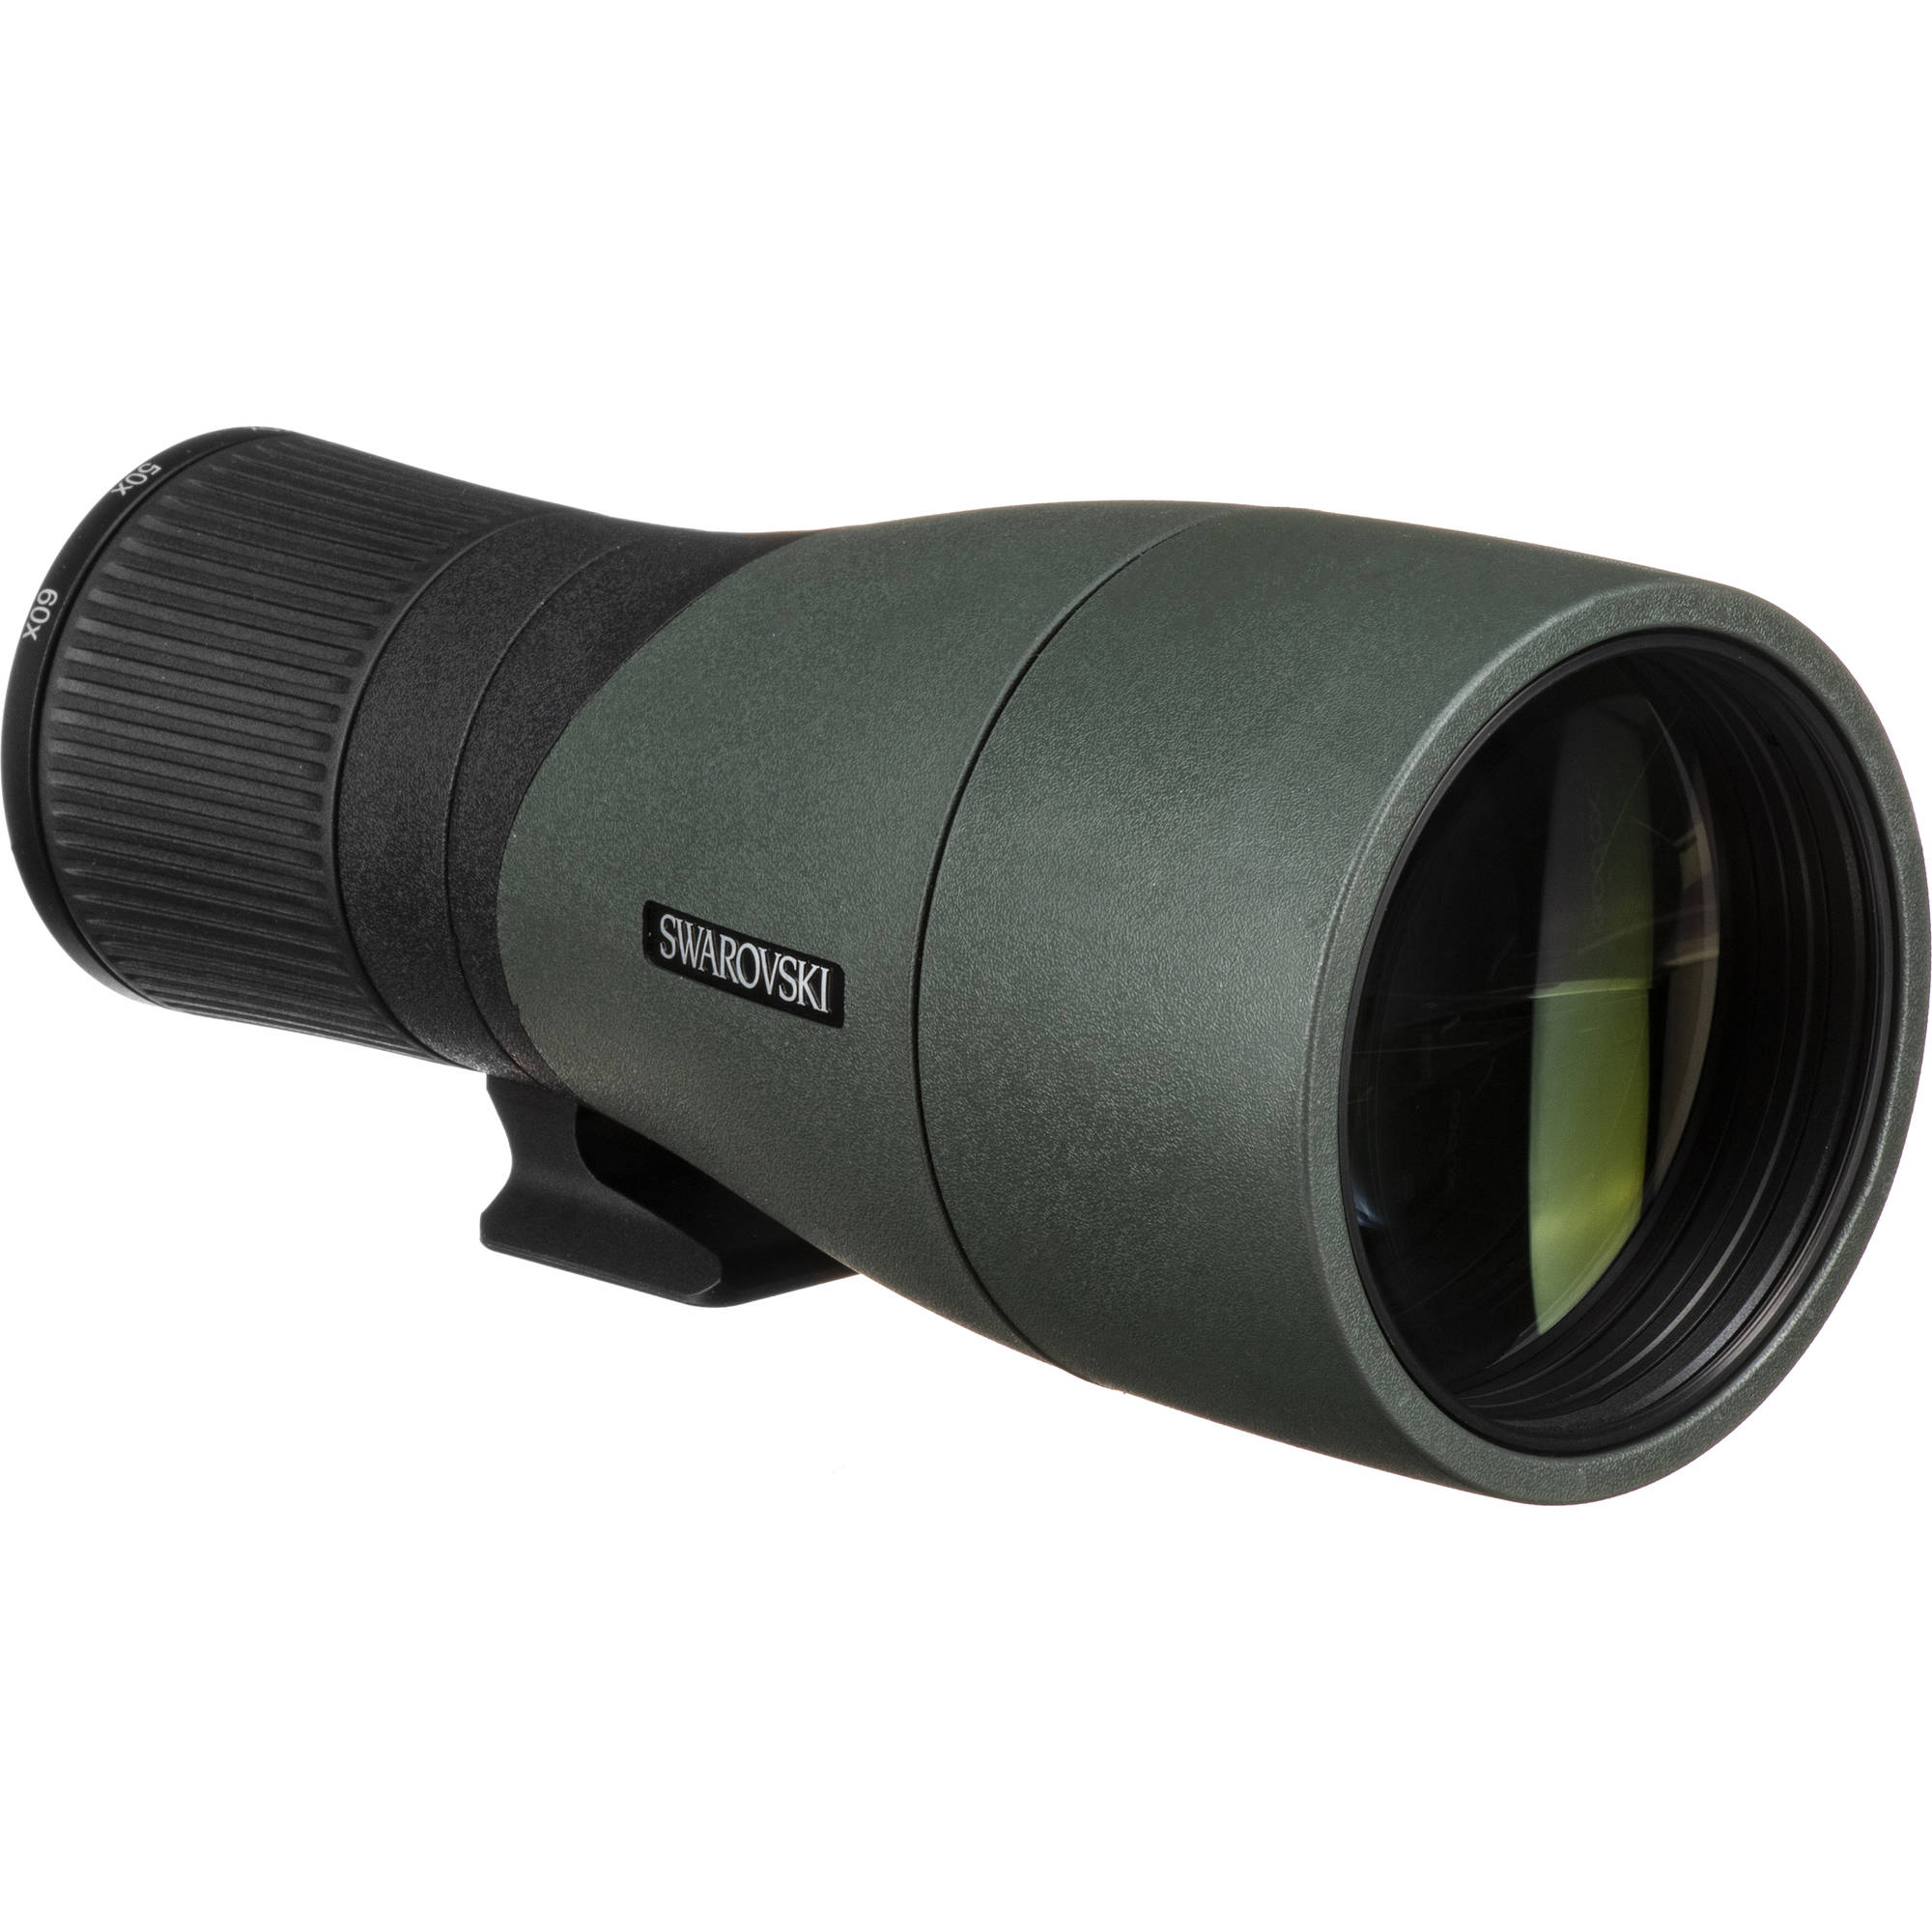 Swarovski Atx Stx Btx 85mm Objective Lens Module 48885 B H Photo